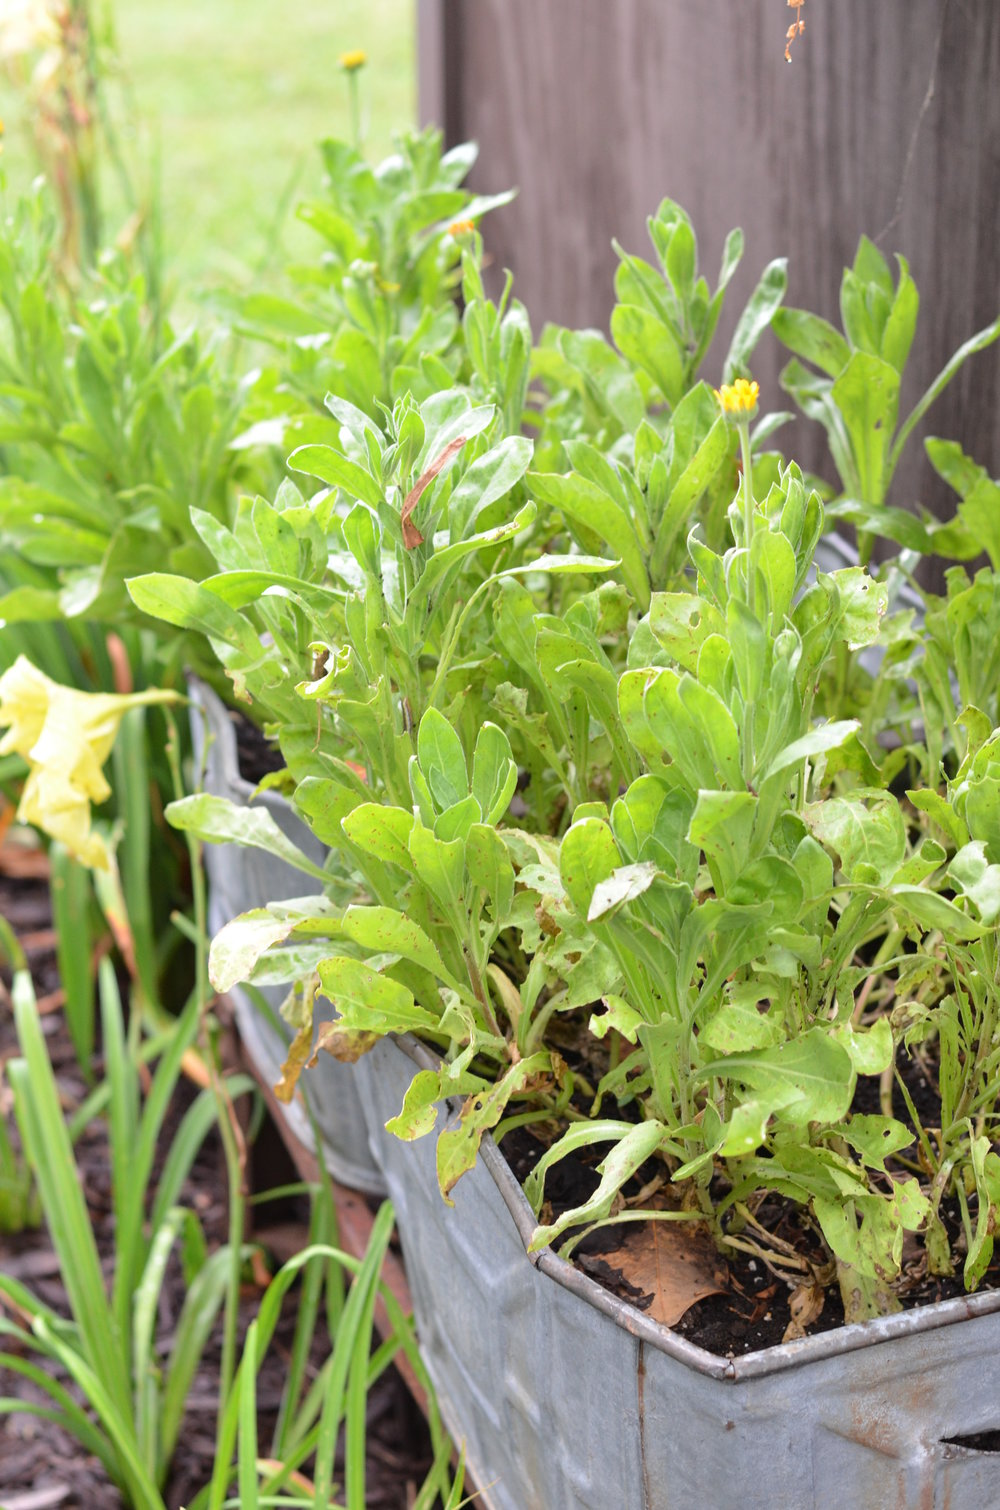 junk garden style in the vegetable garden